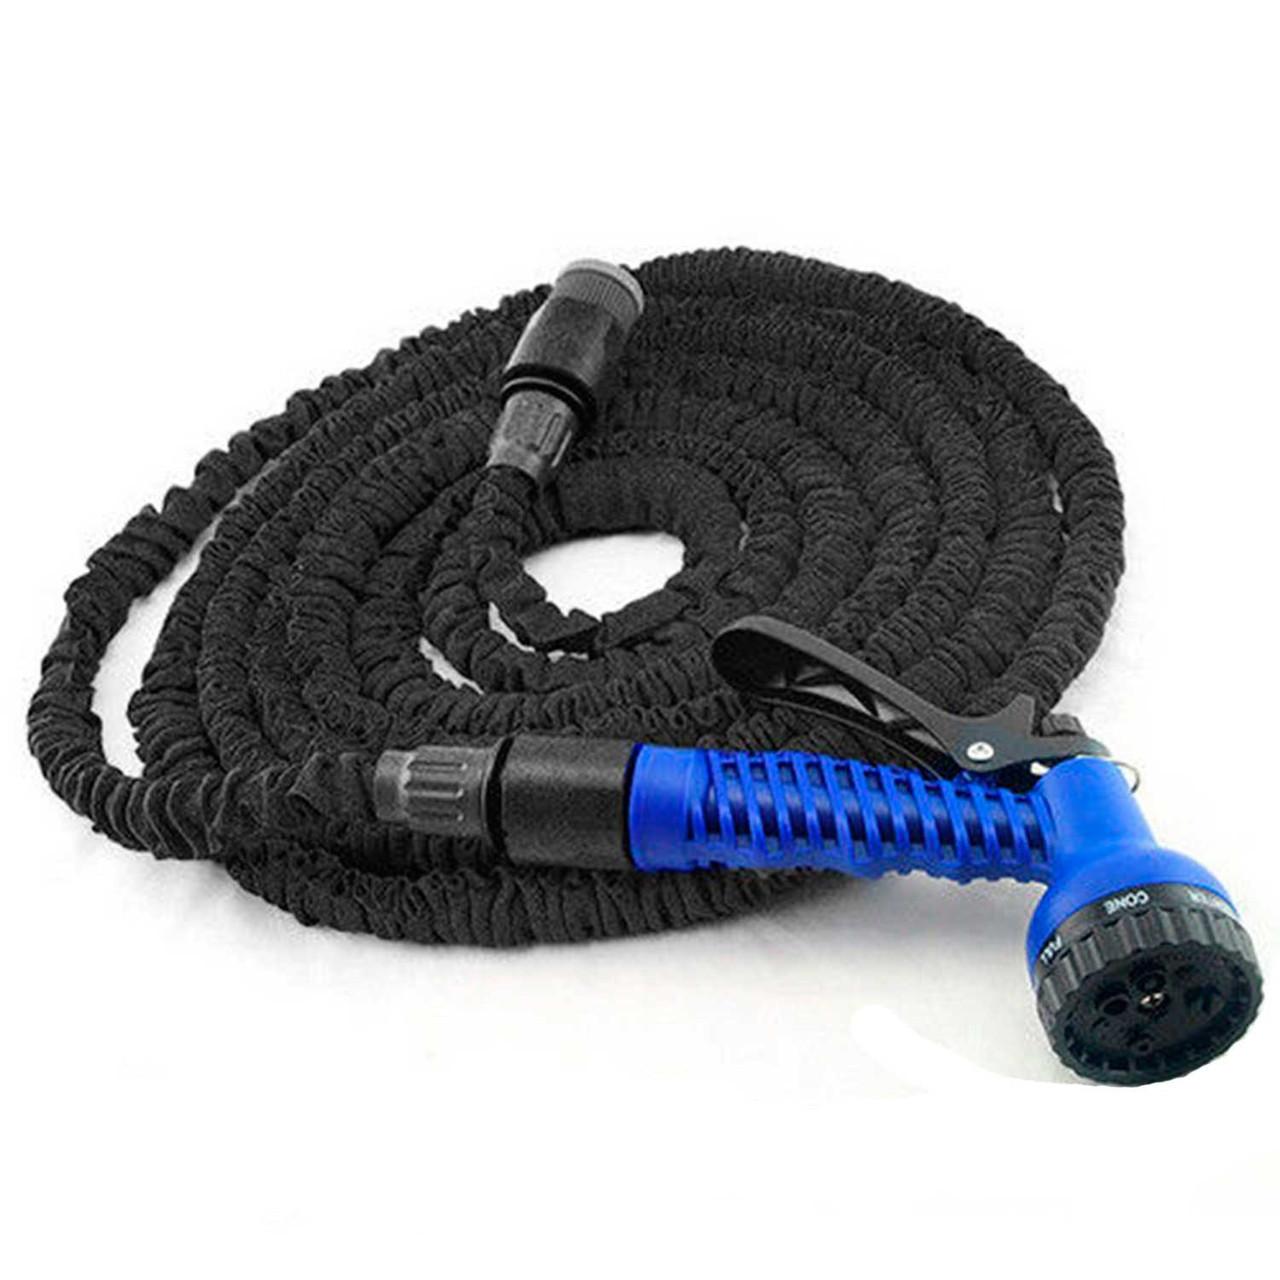 Шланг поливальний X-hose magic hose чорний 37.5 м CX